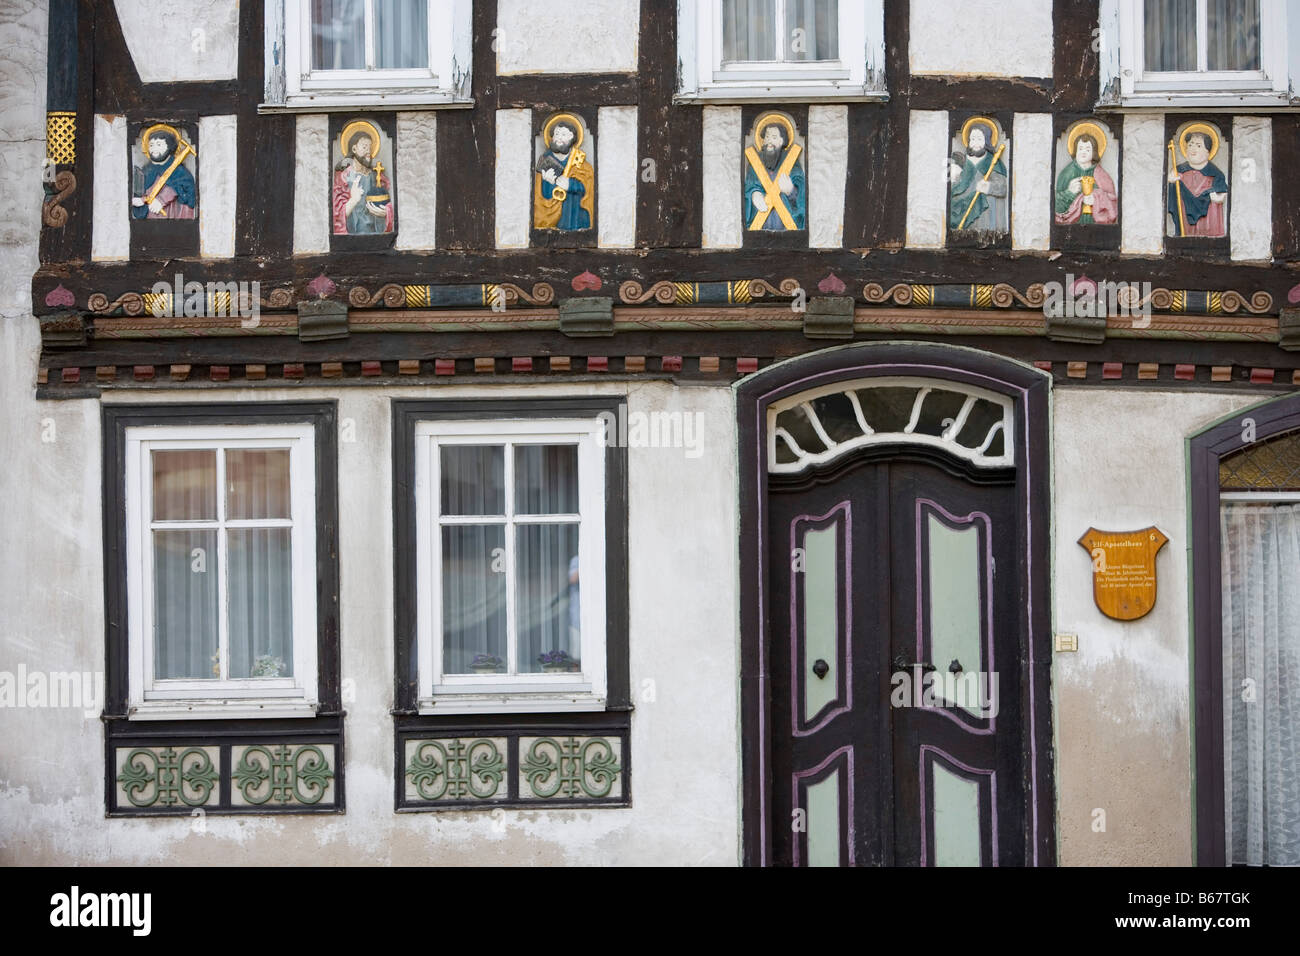 Bezaubernd Fassade Haus Galerie Von Timberframe Of Elf-apostel- 11 Apostles E, Tann,